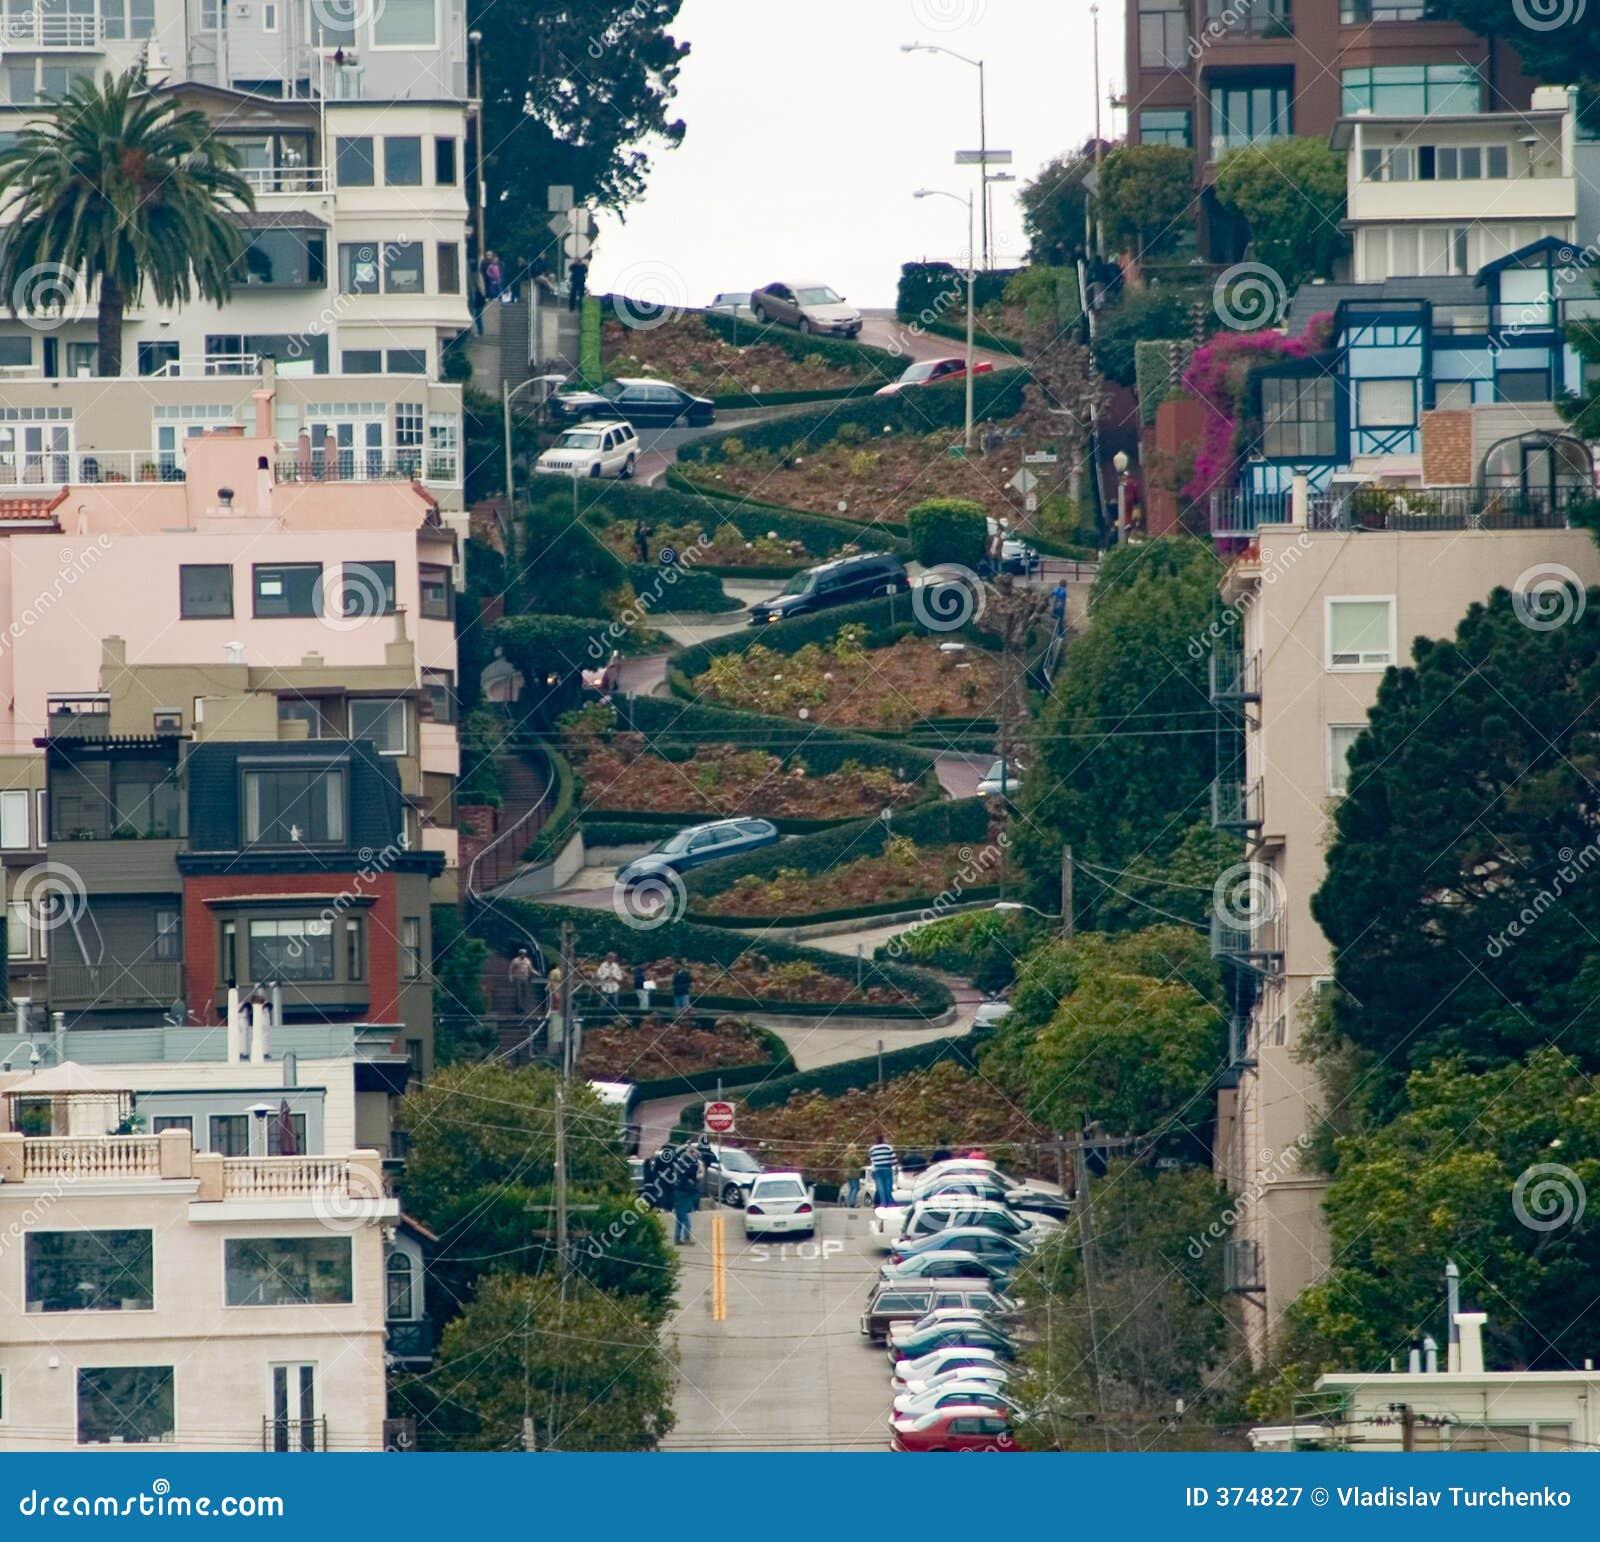 lombardo street view stock image image of california cars 374827. Black Bedroom Furniture Sets. Home Design Ideas